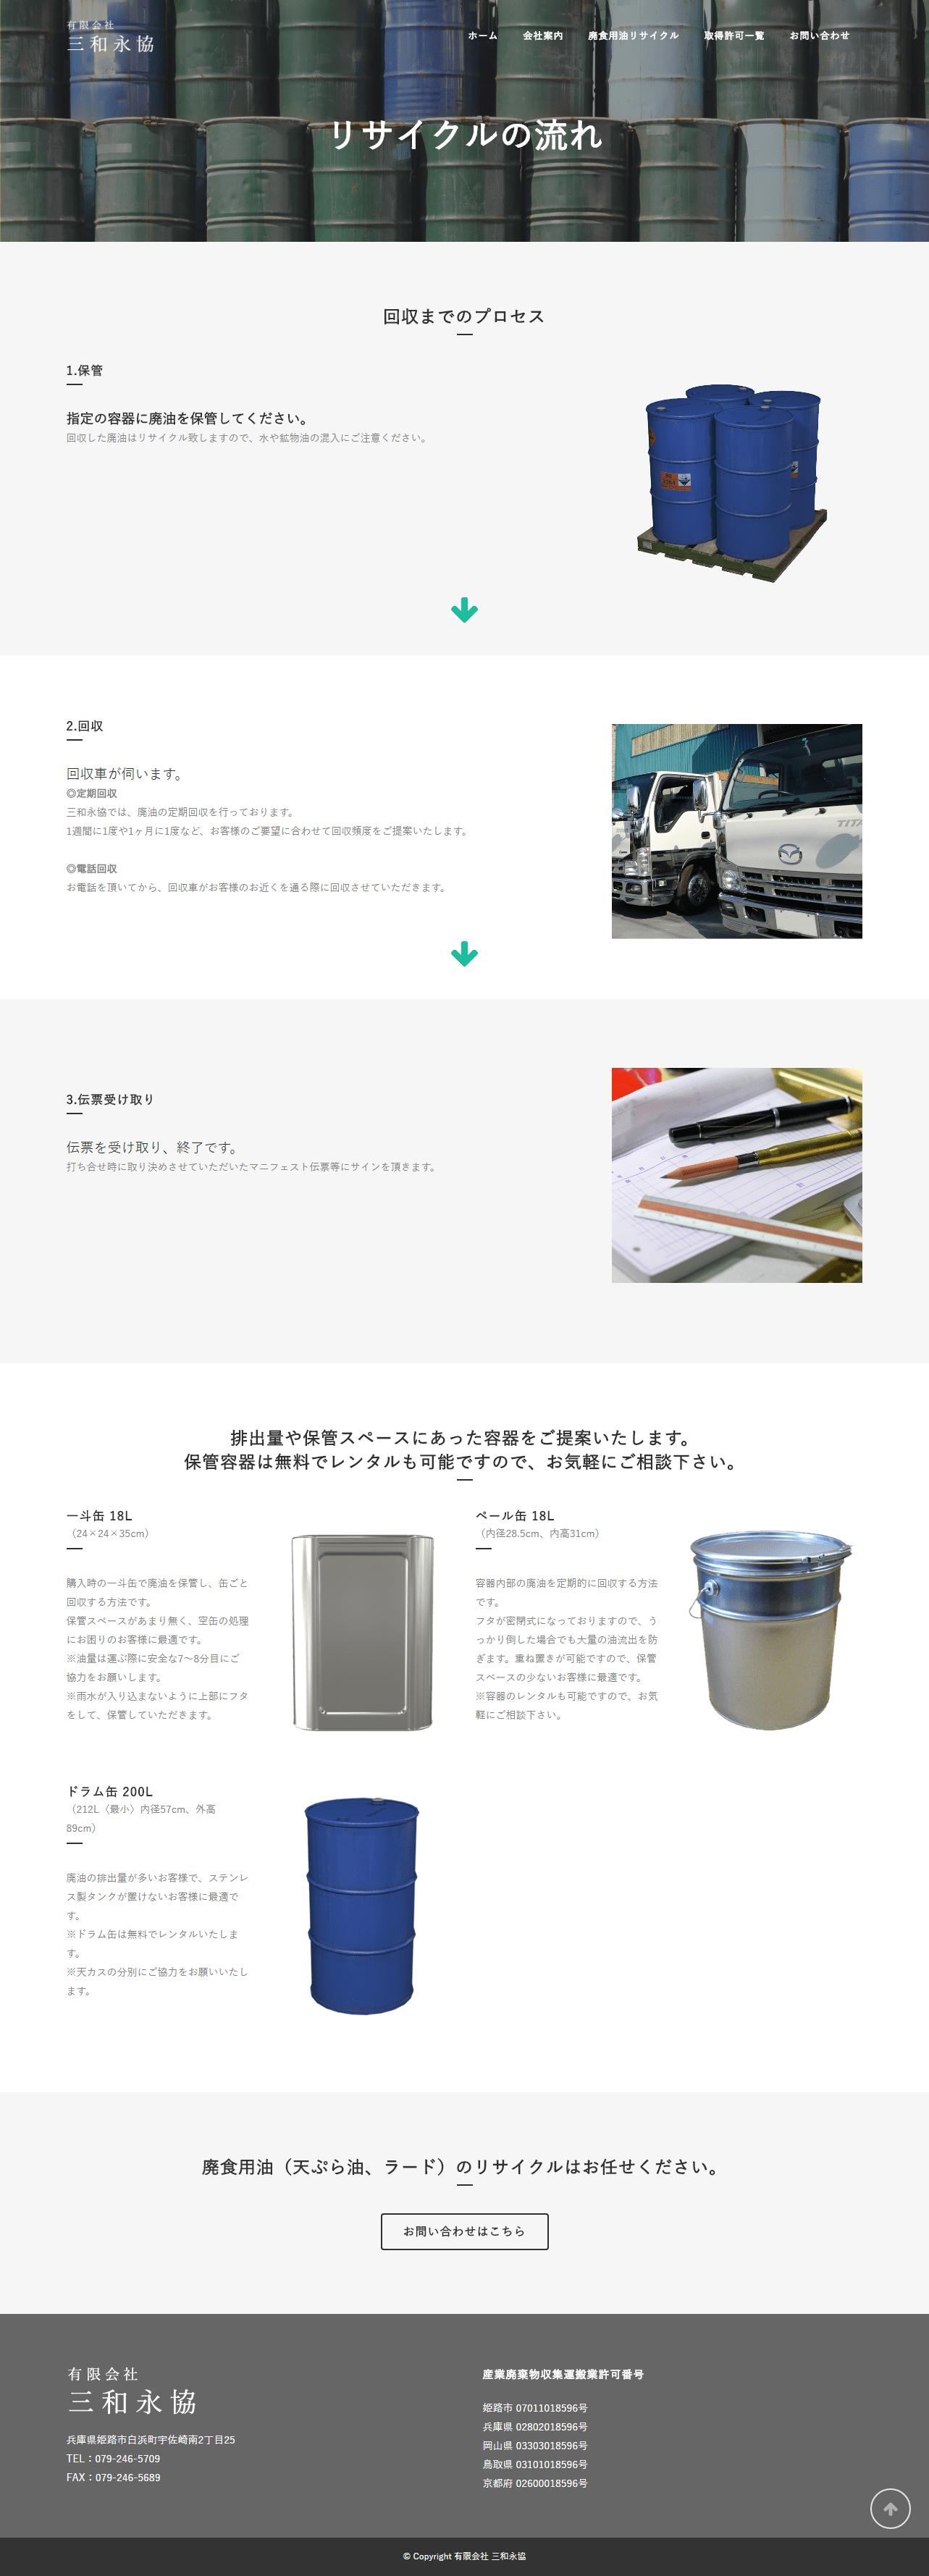 姫路市 有限会社三和永協様 ホームページ制作2